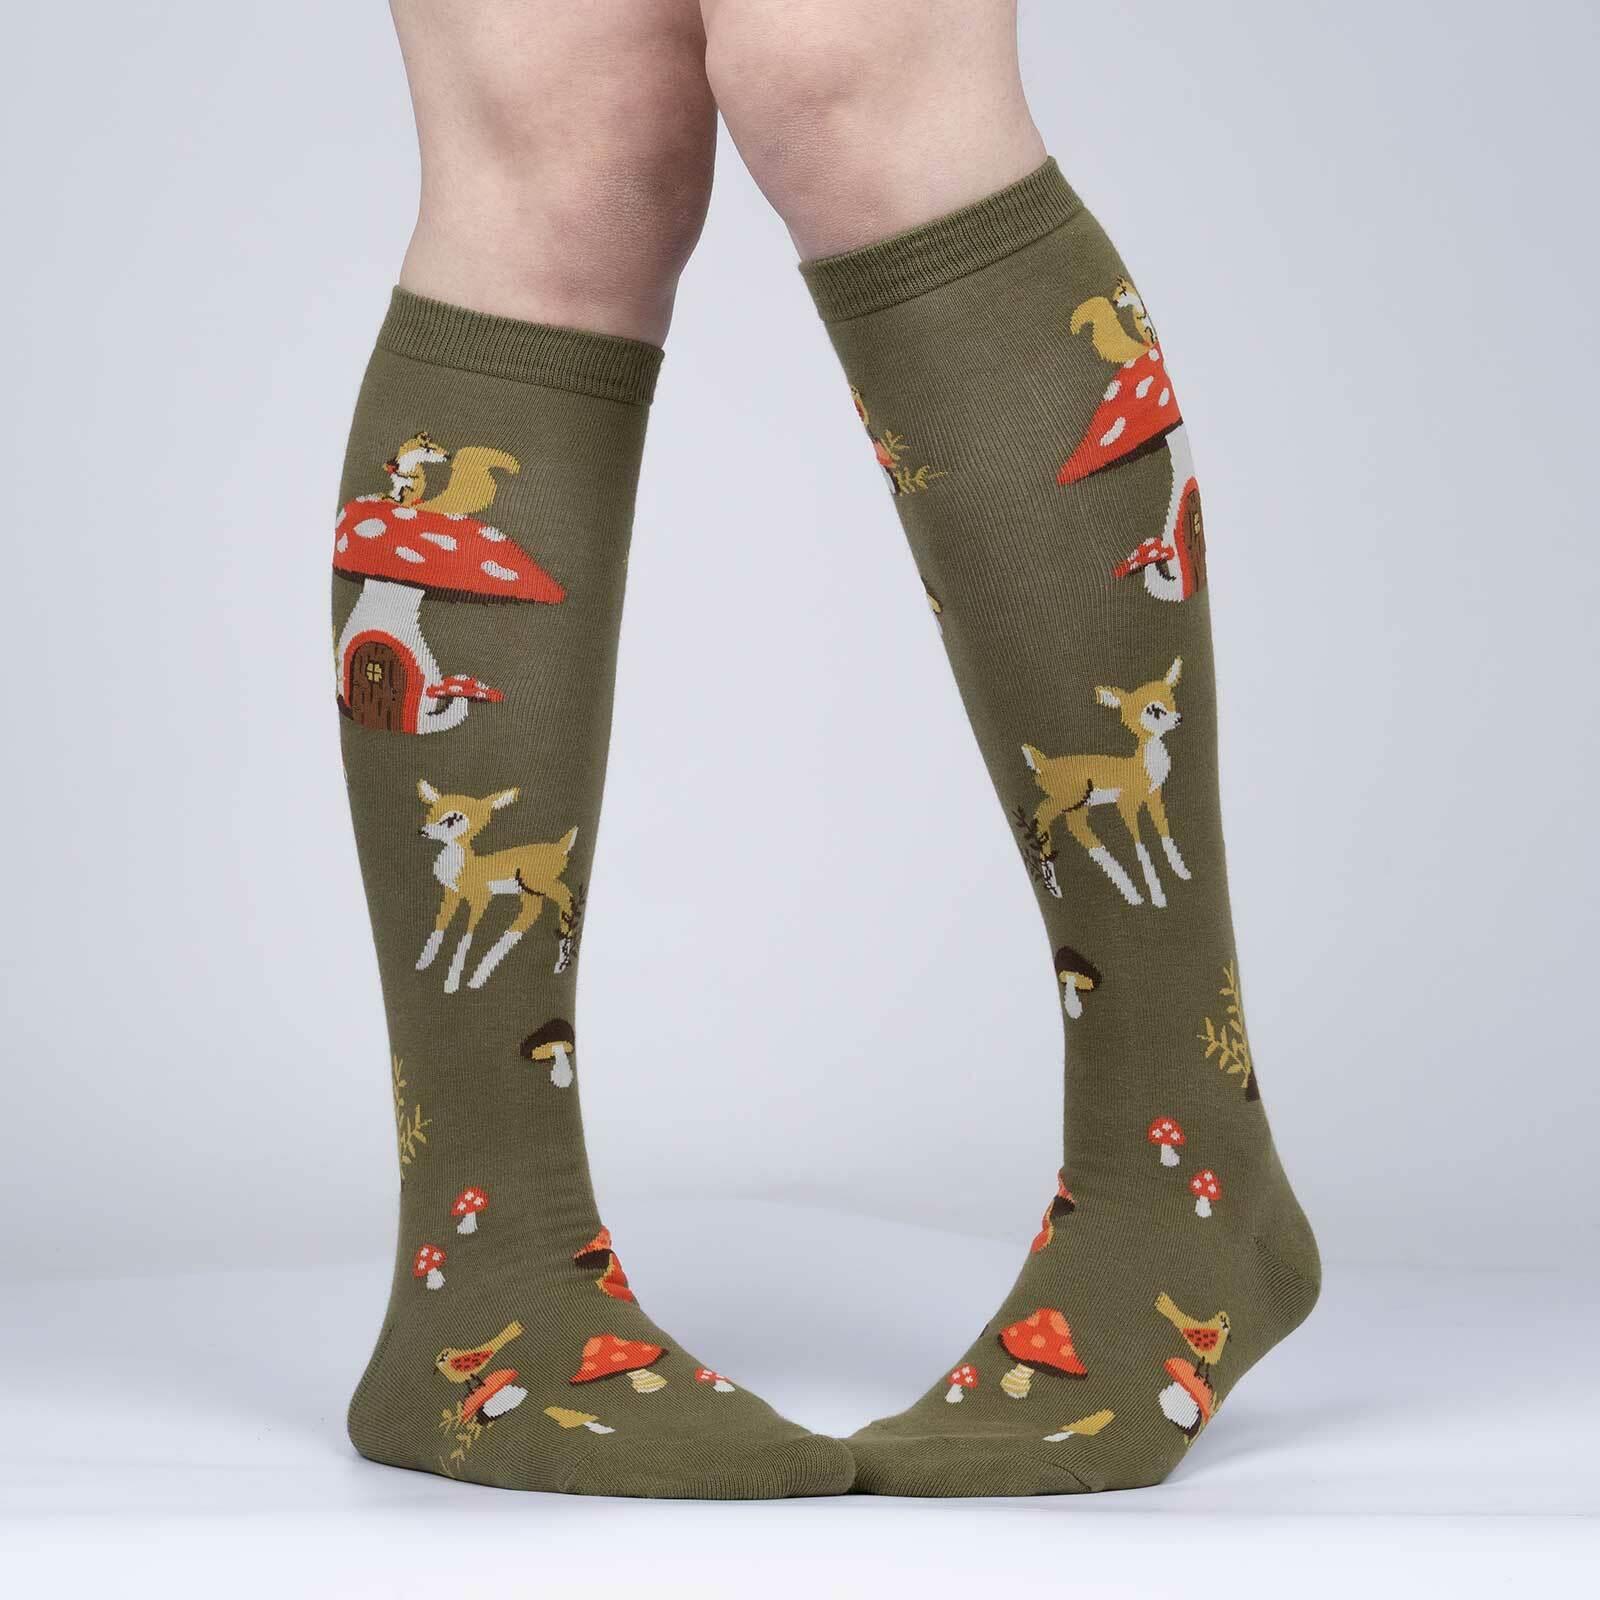 model wearing Shroom and Board - Nature Mushroom Knee Socks - Women's